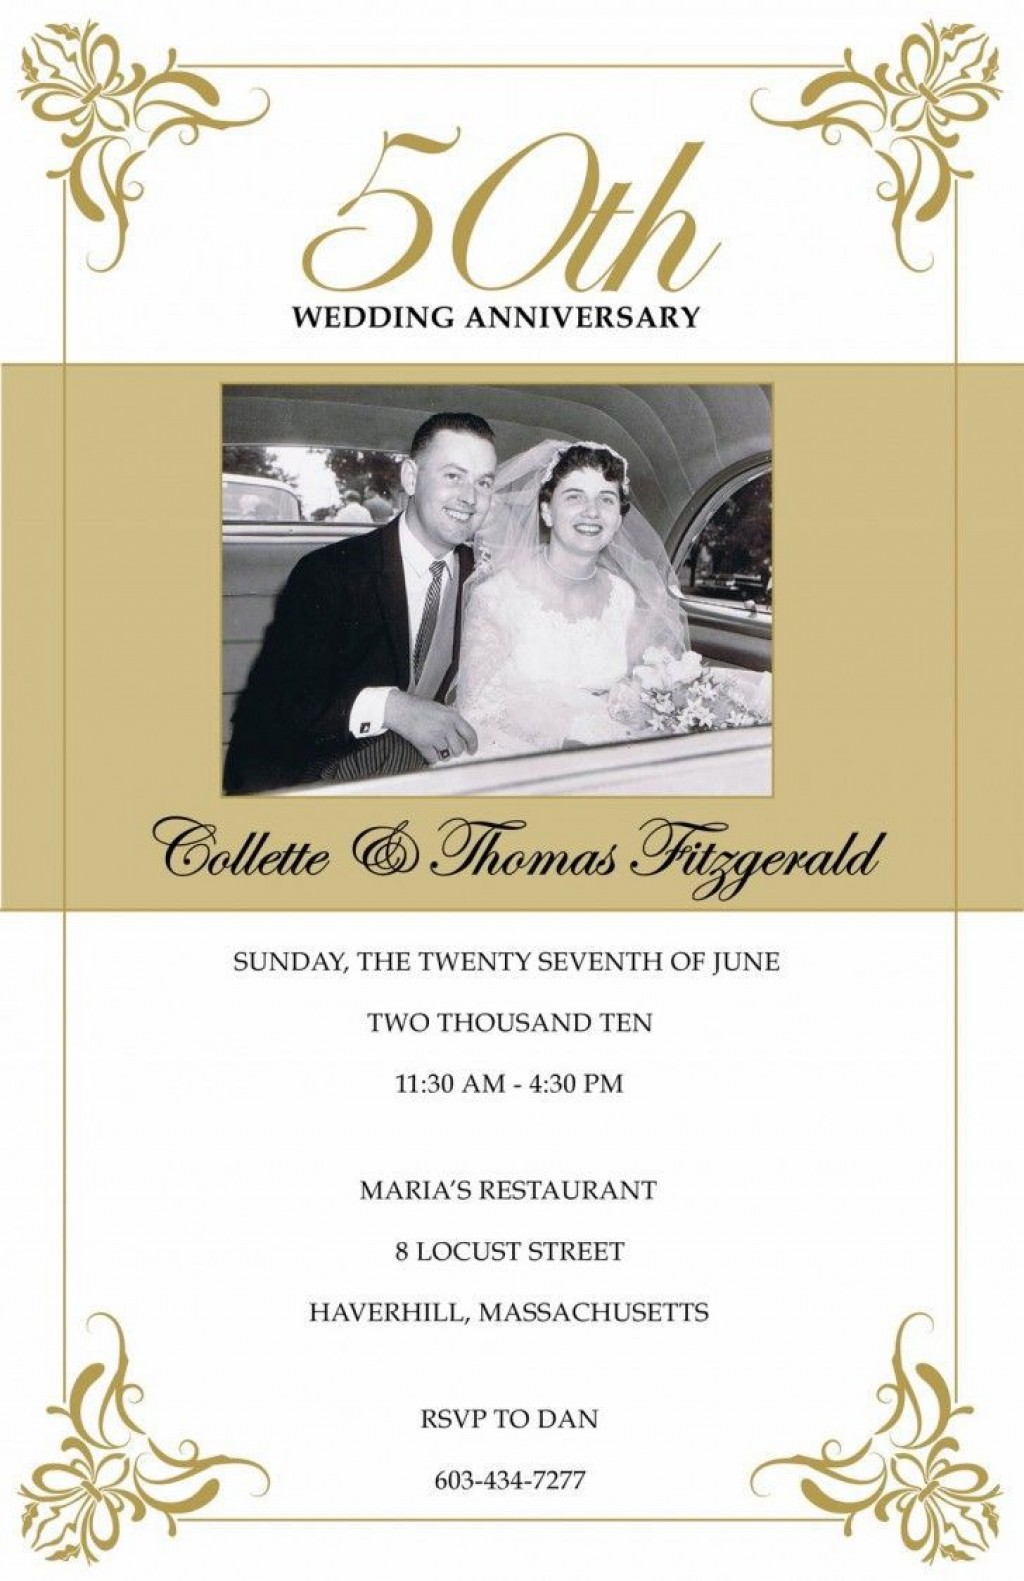 008 Magnificent 50th Wedding Anniversary Invitation Template Free Design  Download Golden Microsoft WordLarge